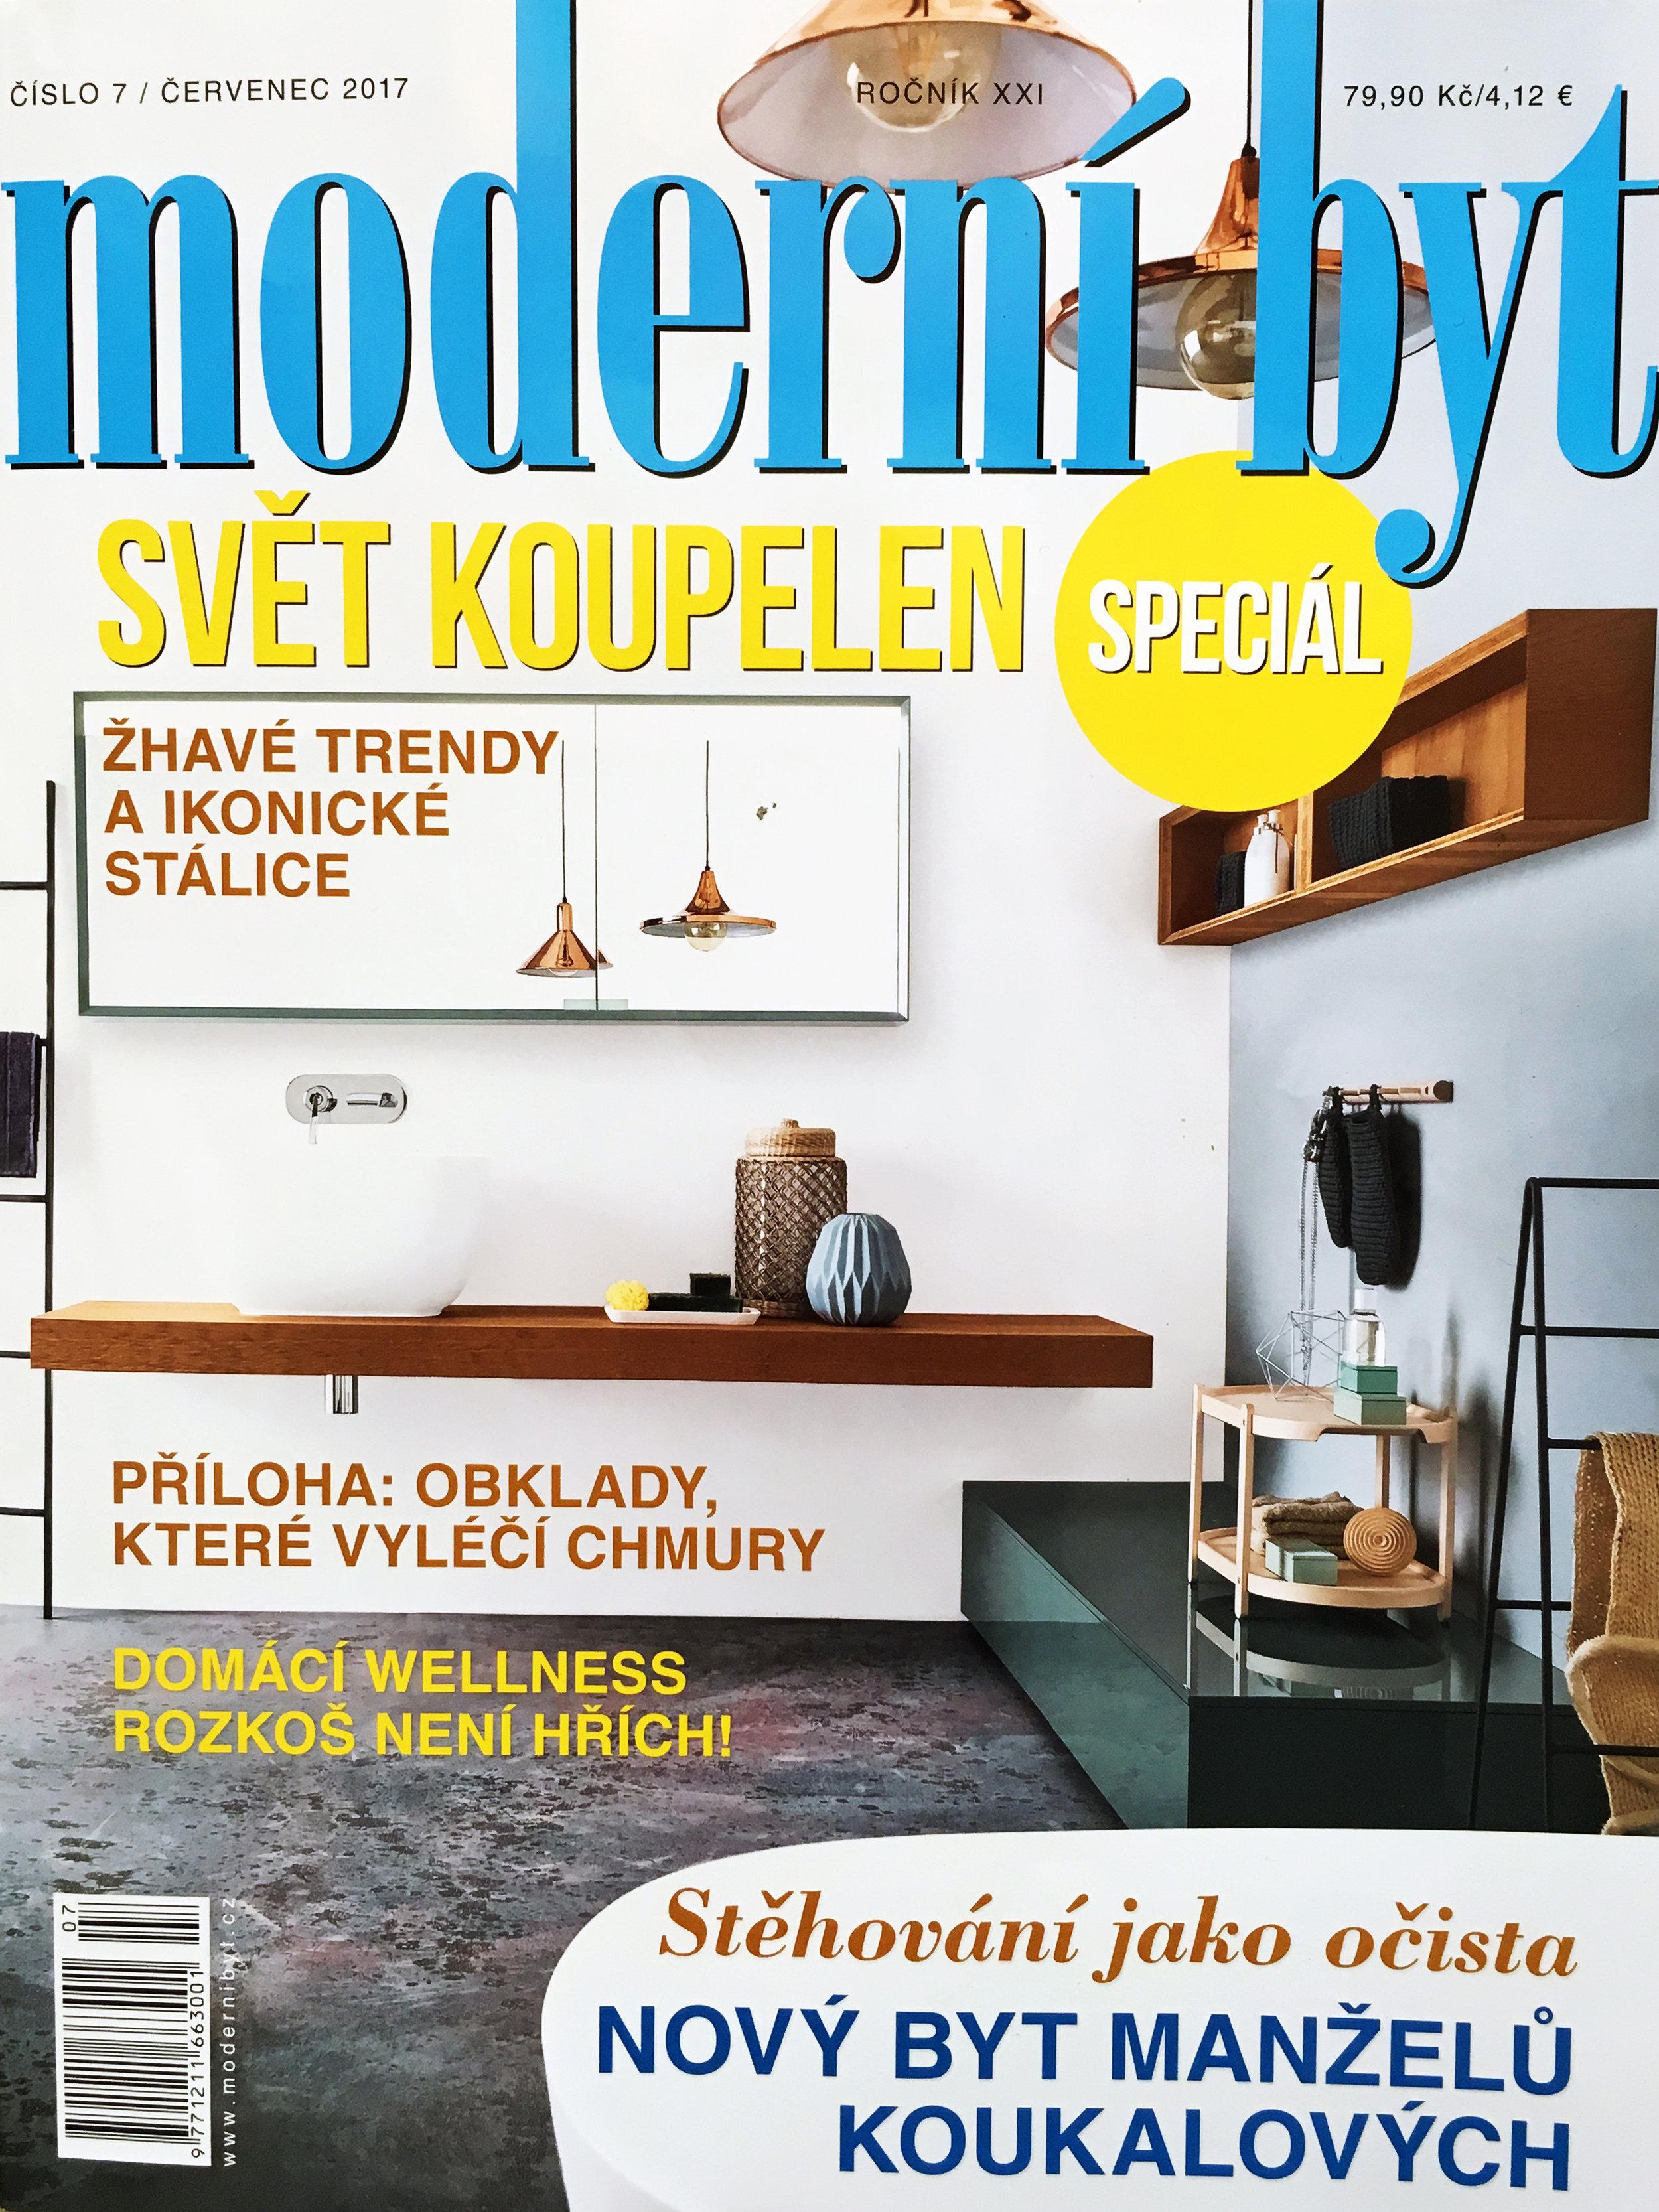 moderni byt - loft hrebenky